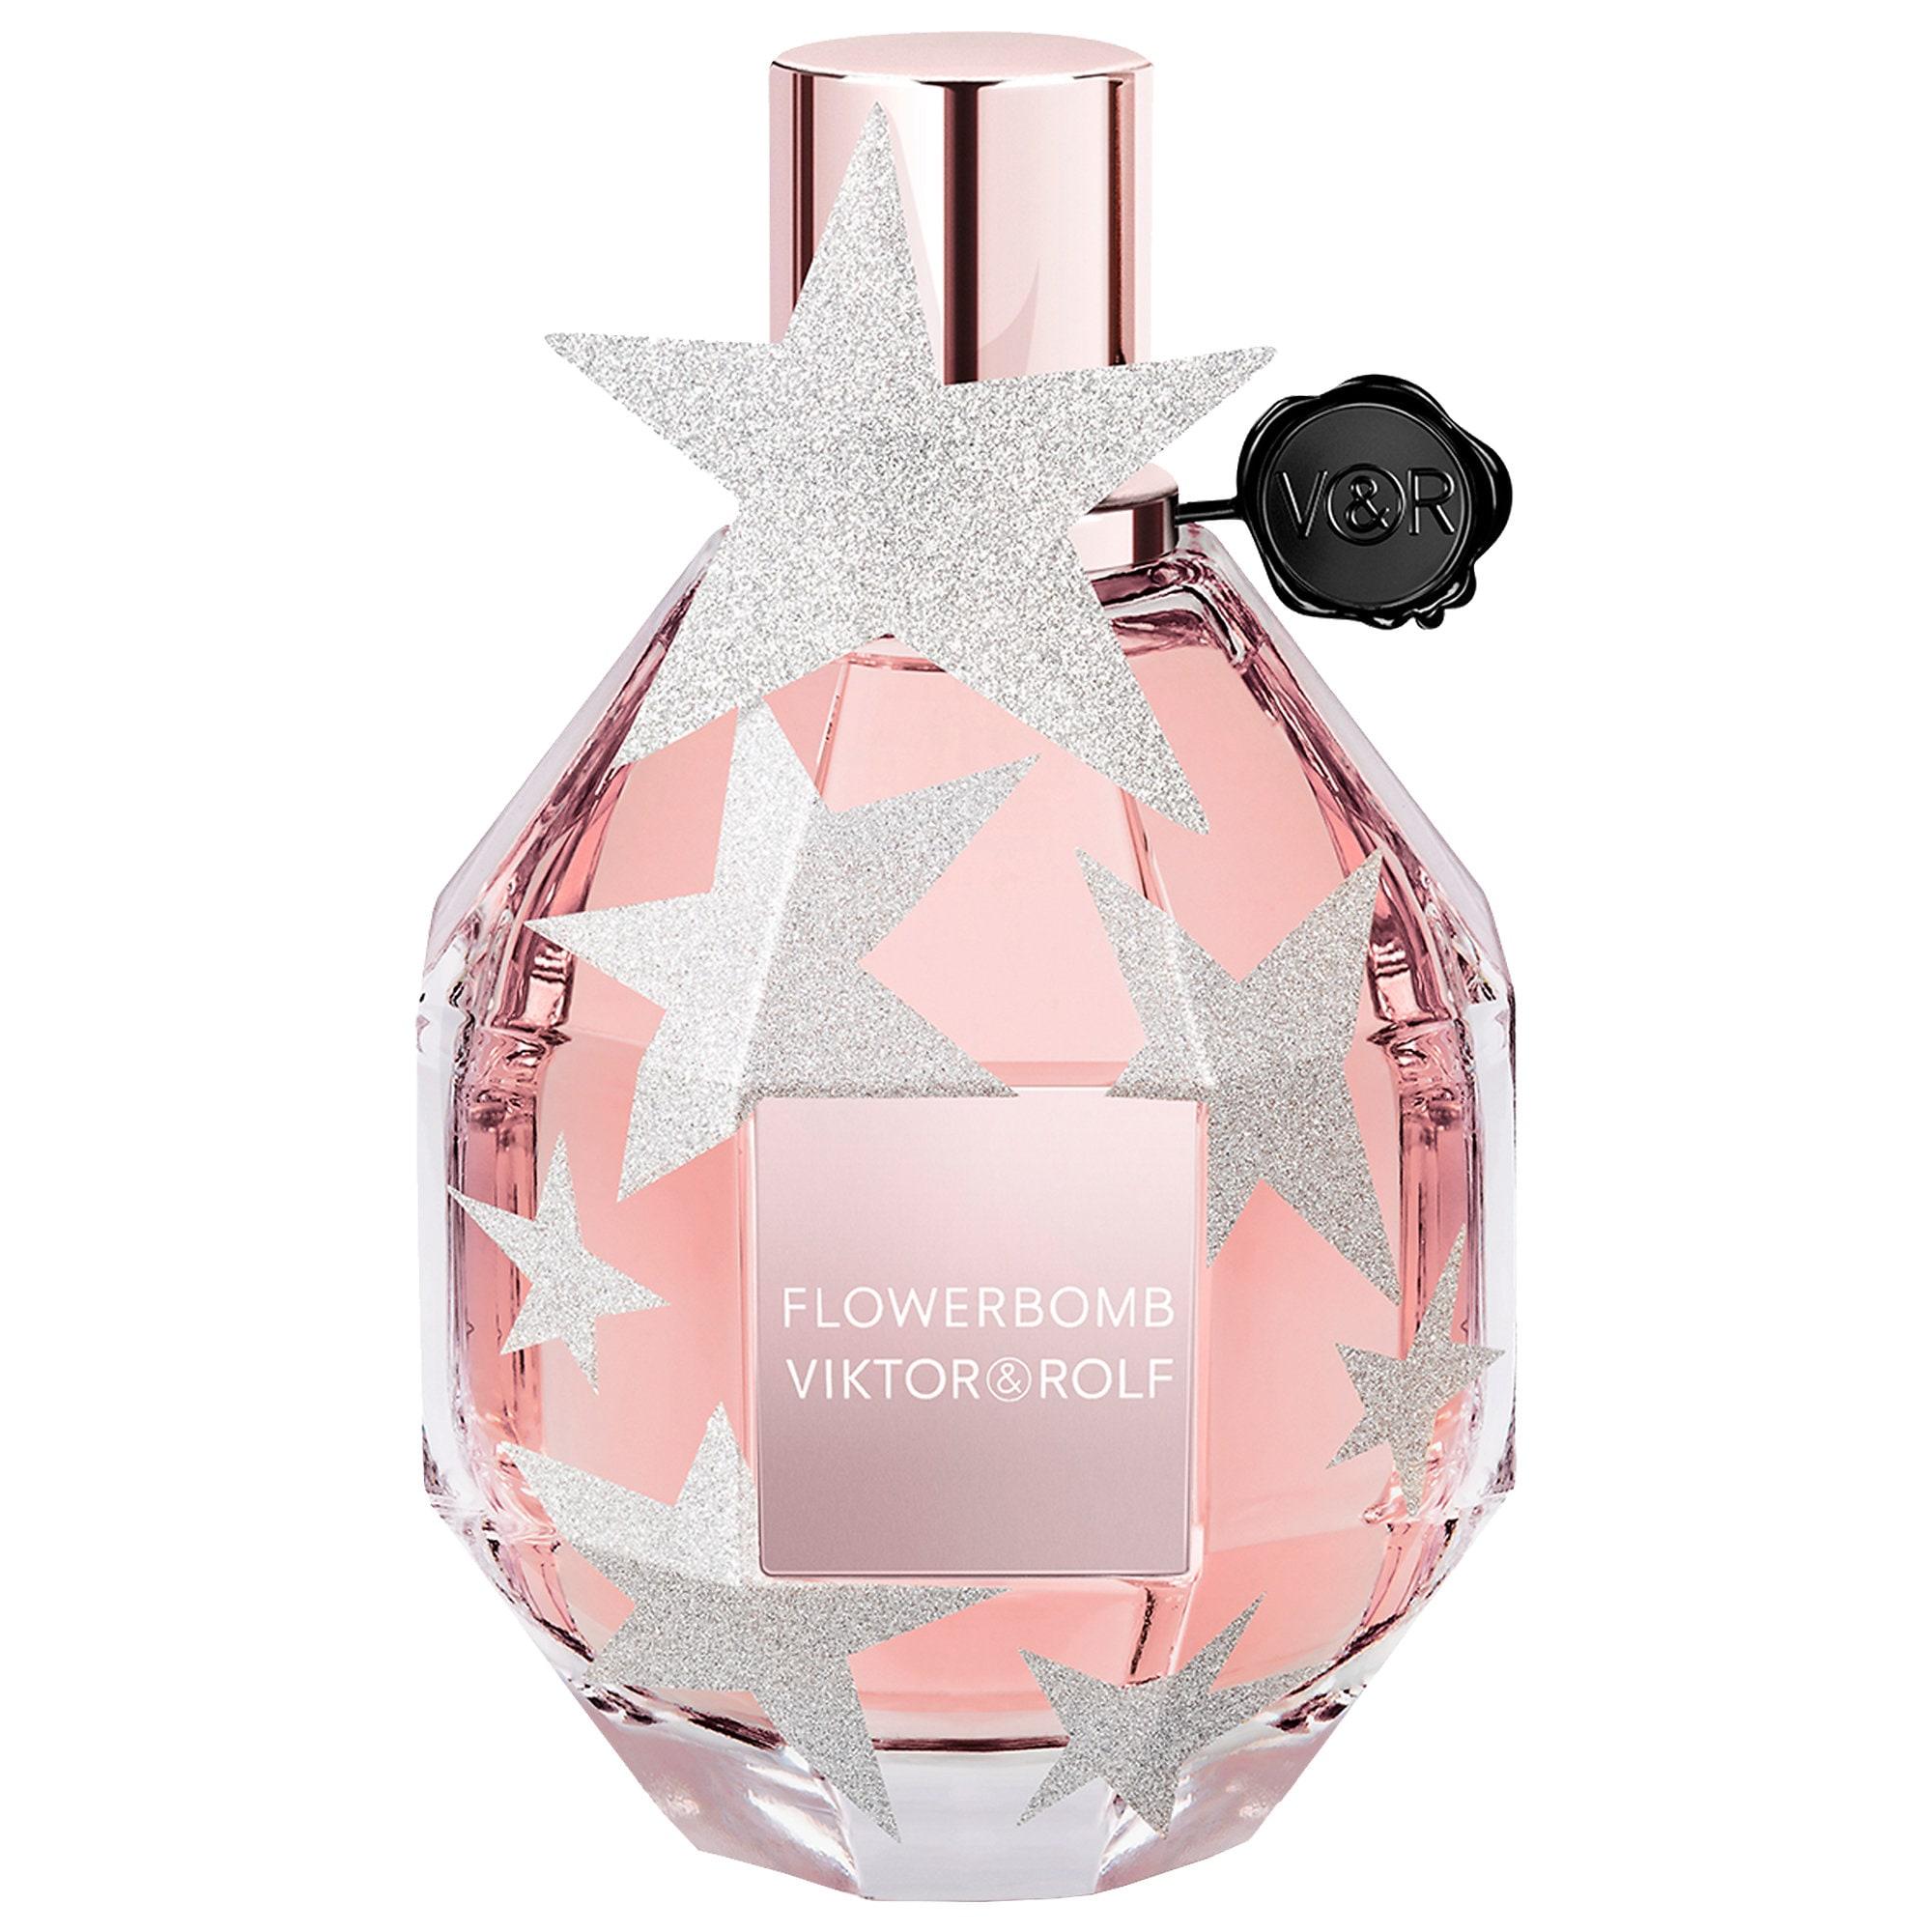 Viktor&Rolf - Limited Edition Flowerbomb Eau de Parfum